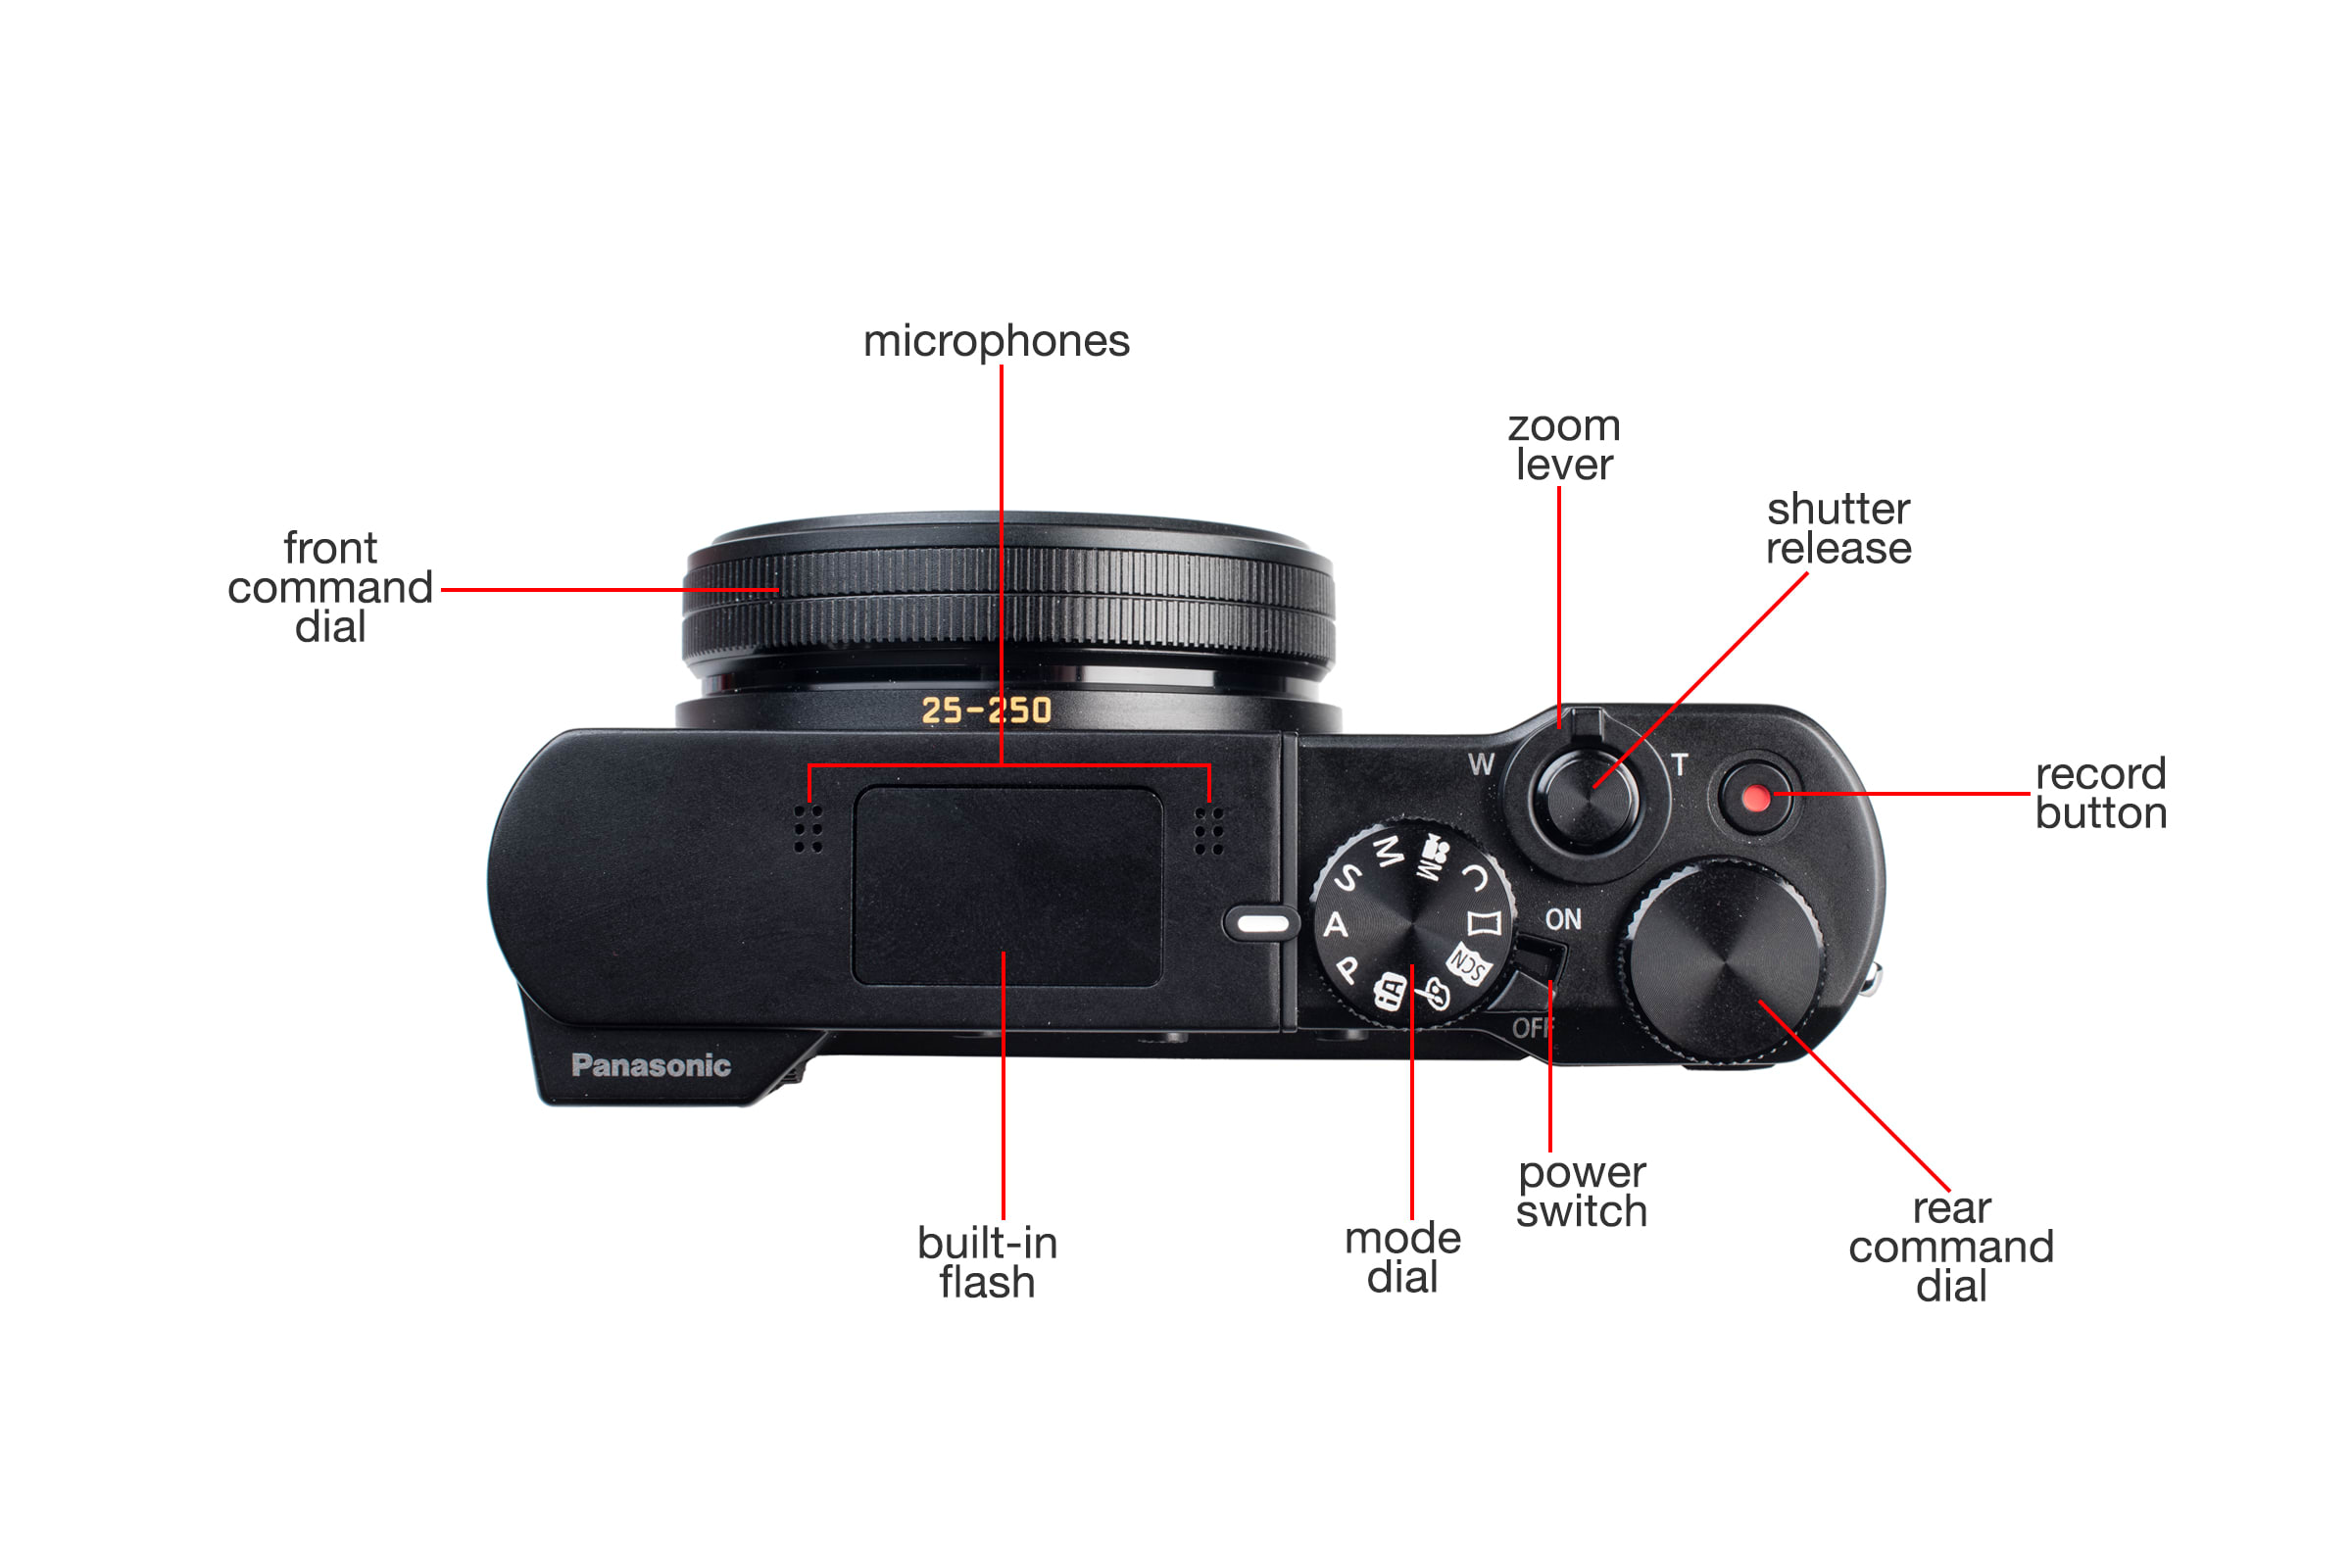 Top view of the Panasonic Lumix ZS100.